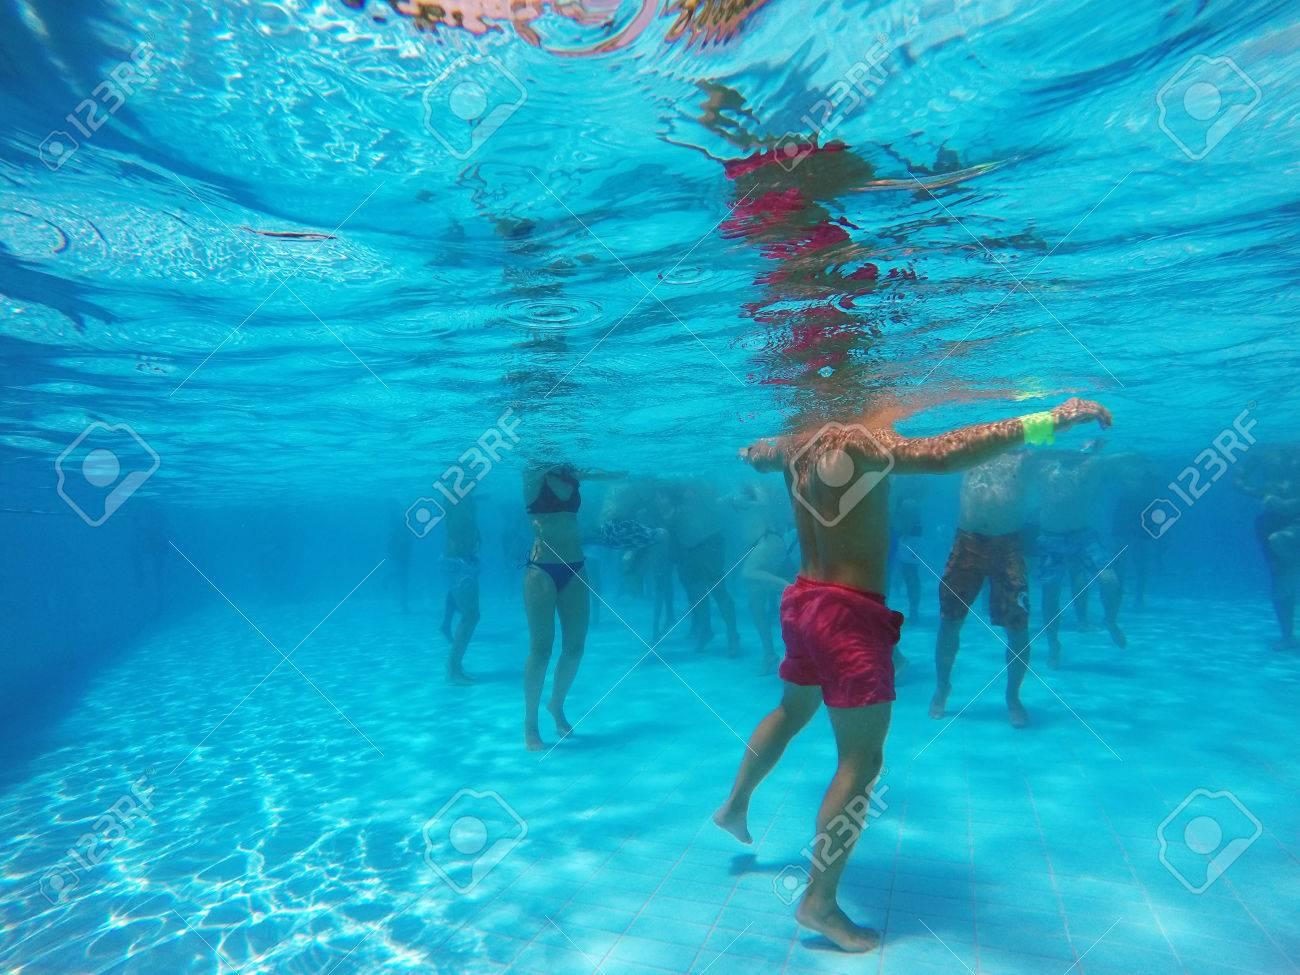 aqua aerobics in the pool - 60570924